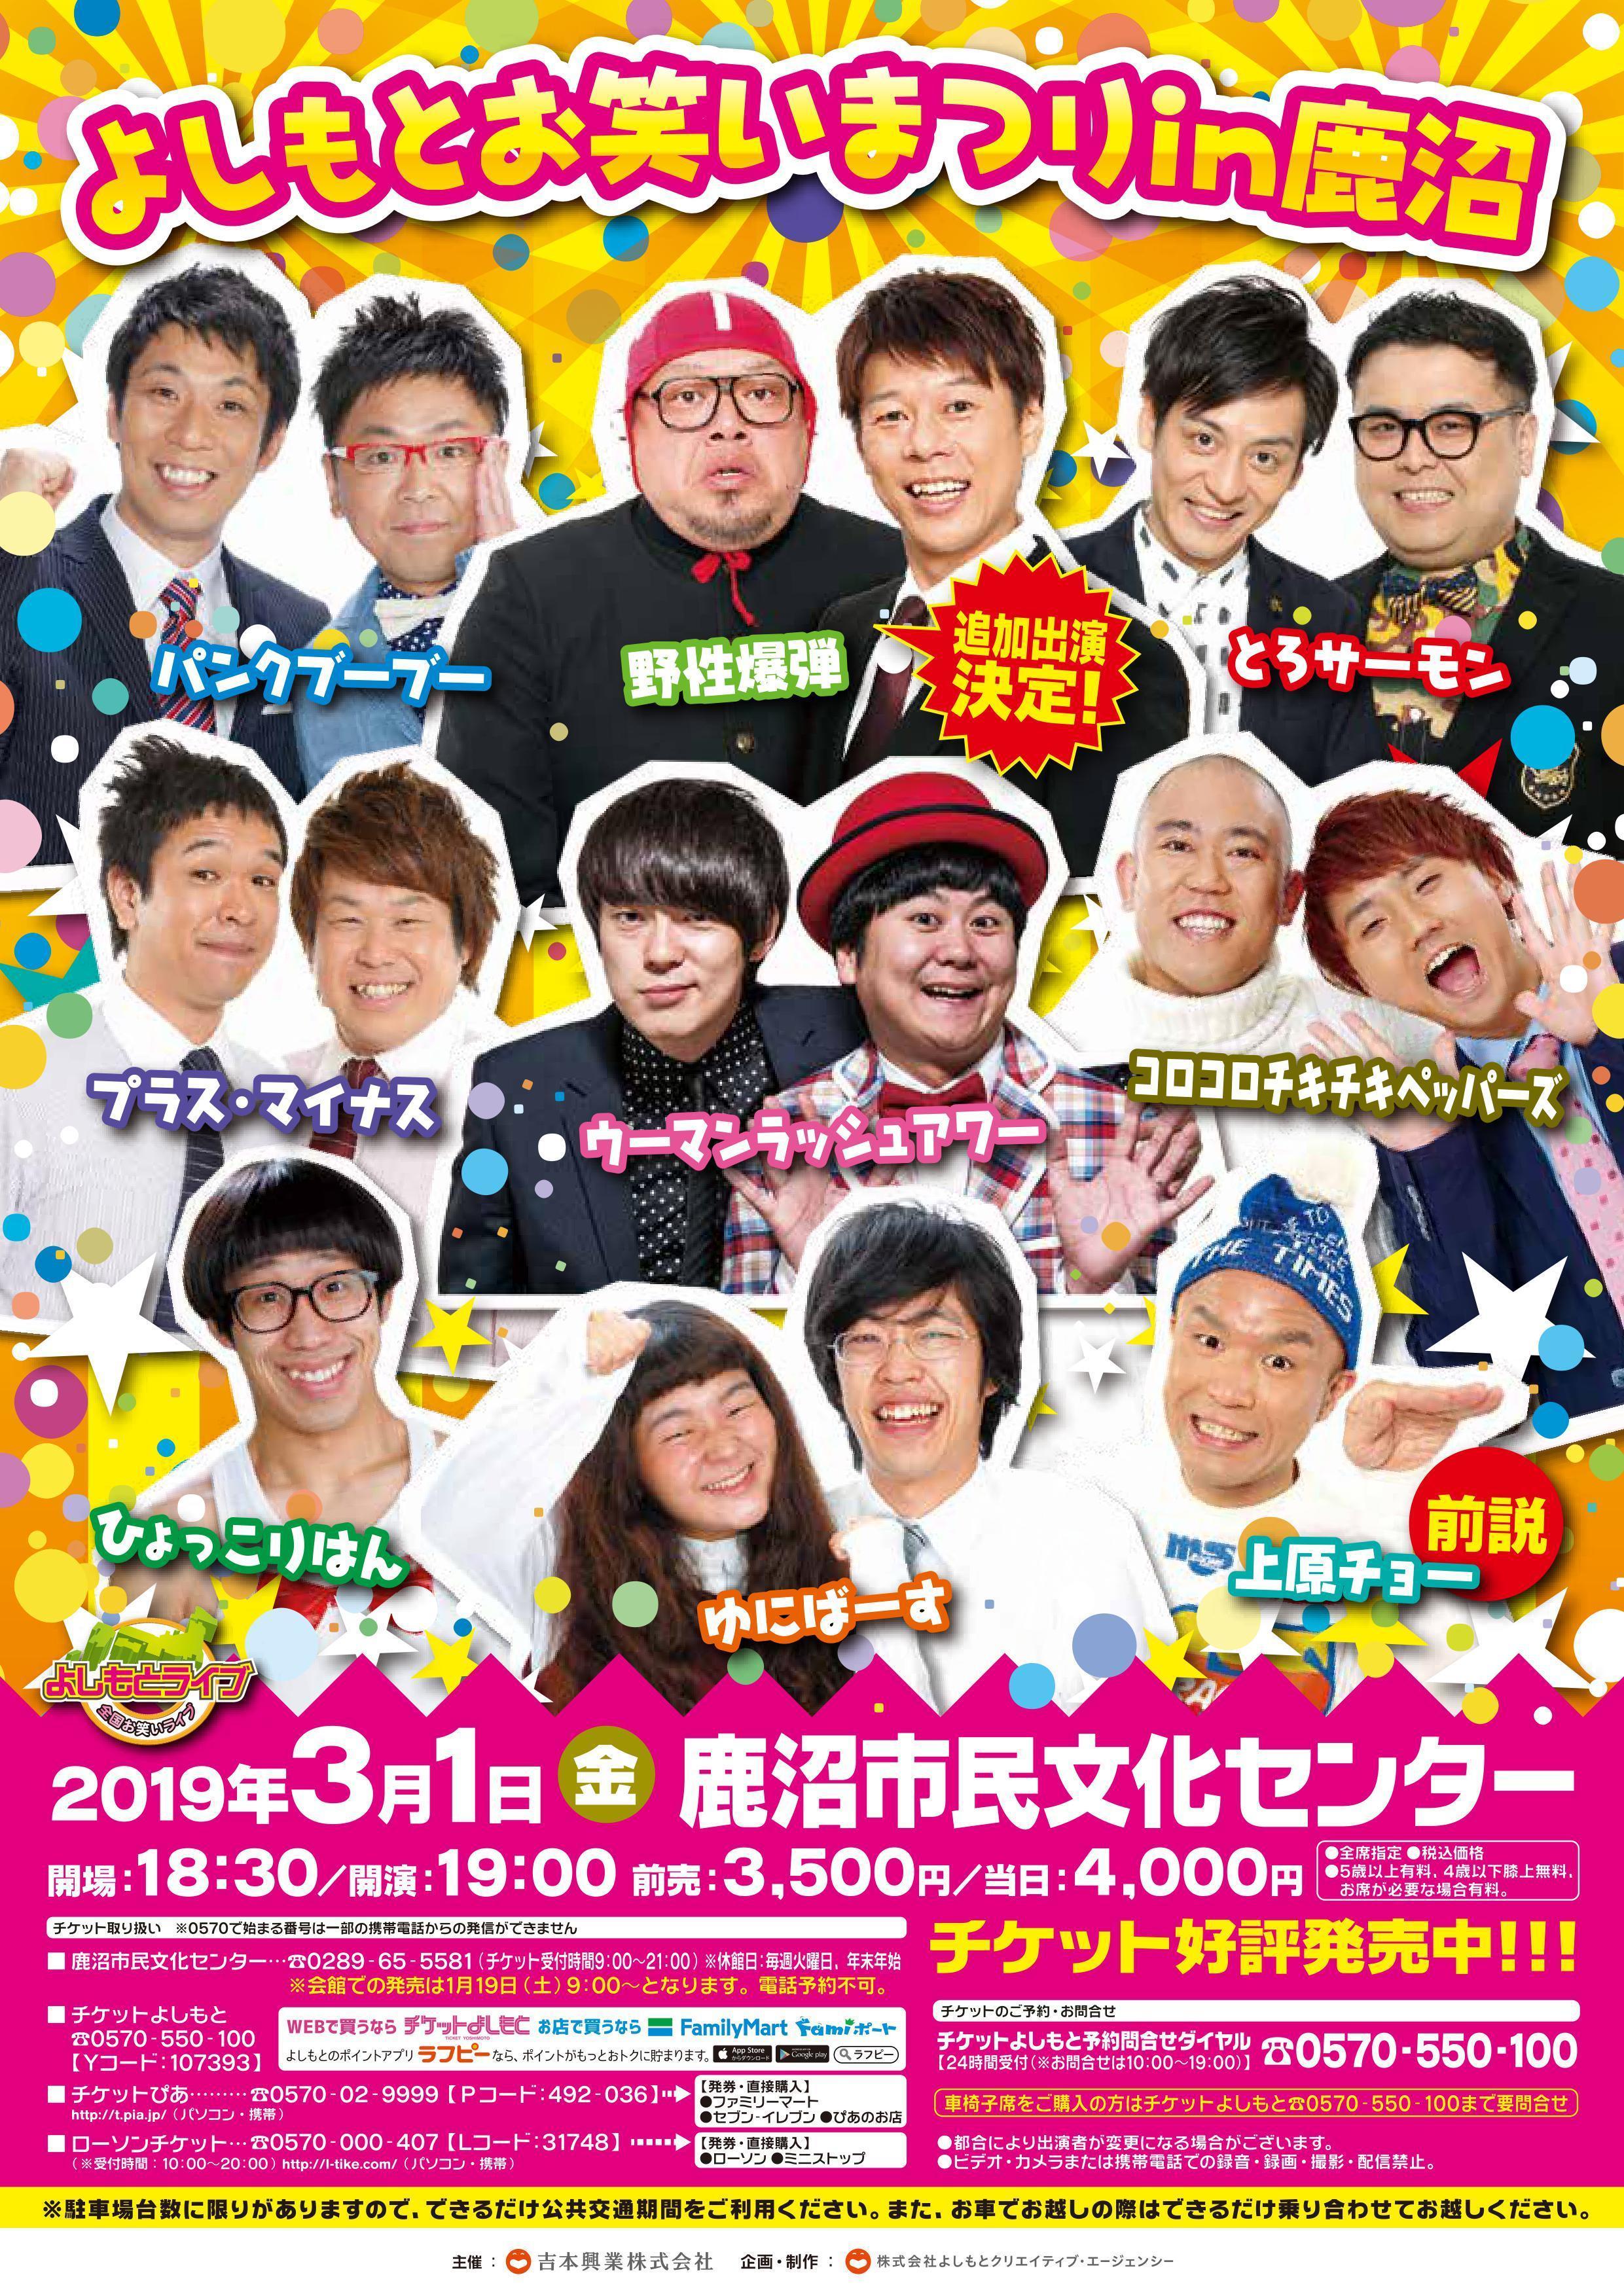 http://www.syumatsu.jp/20190201183223-bb9c9241226c75b568fba682a5591356b0eb15c4.jpg